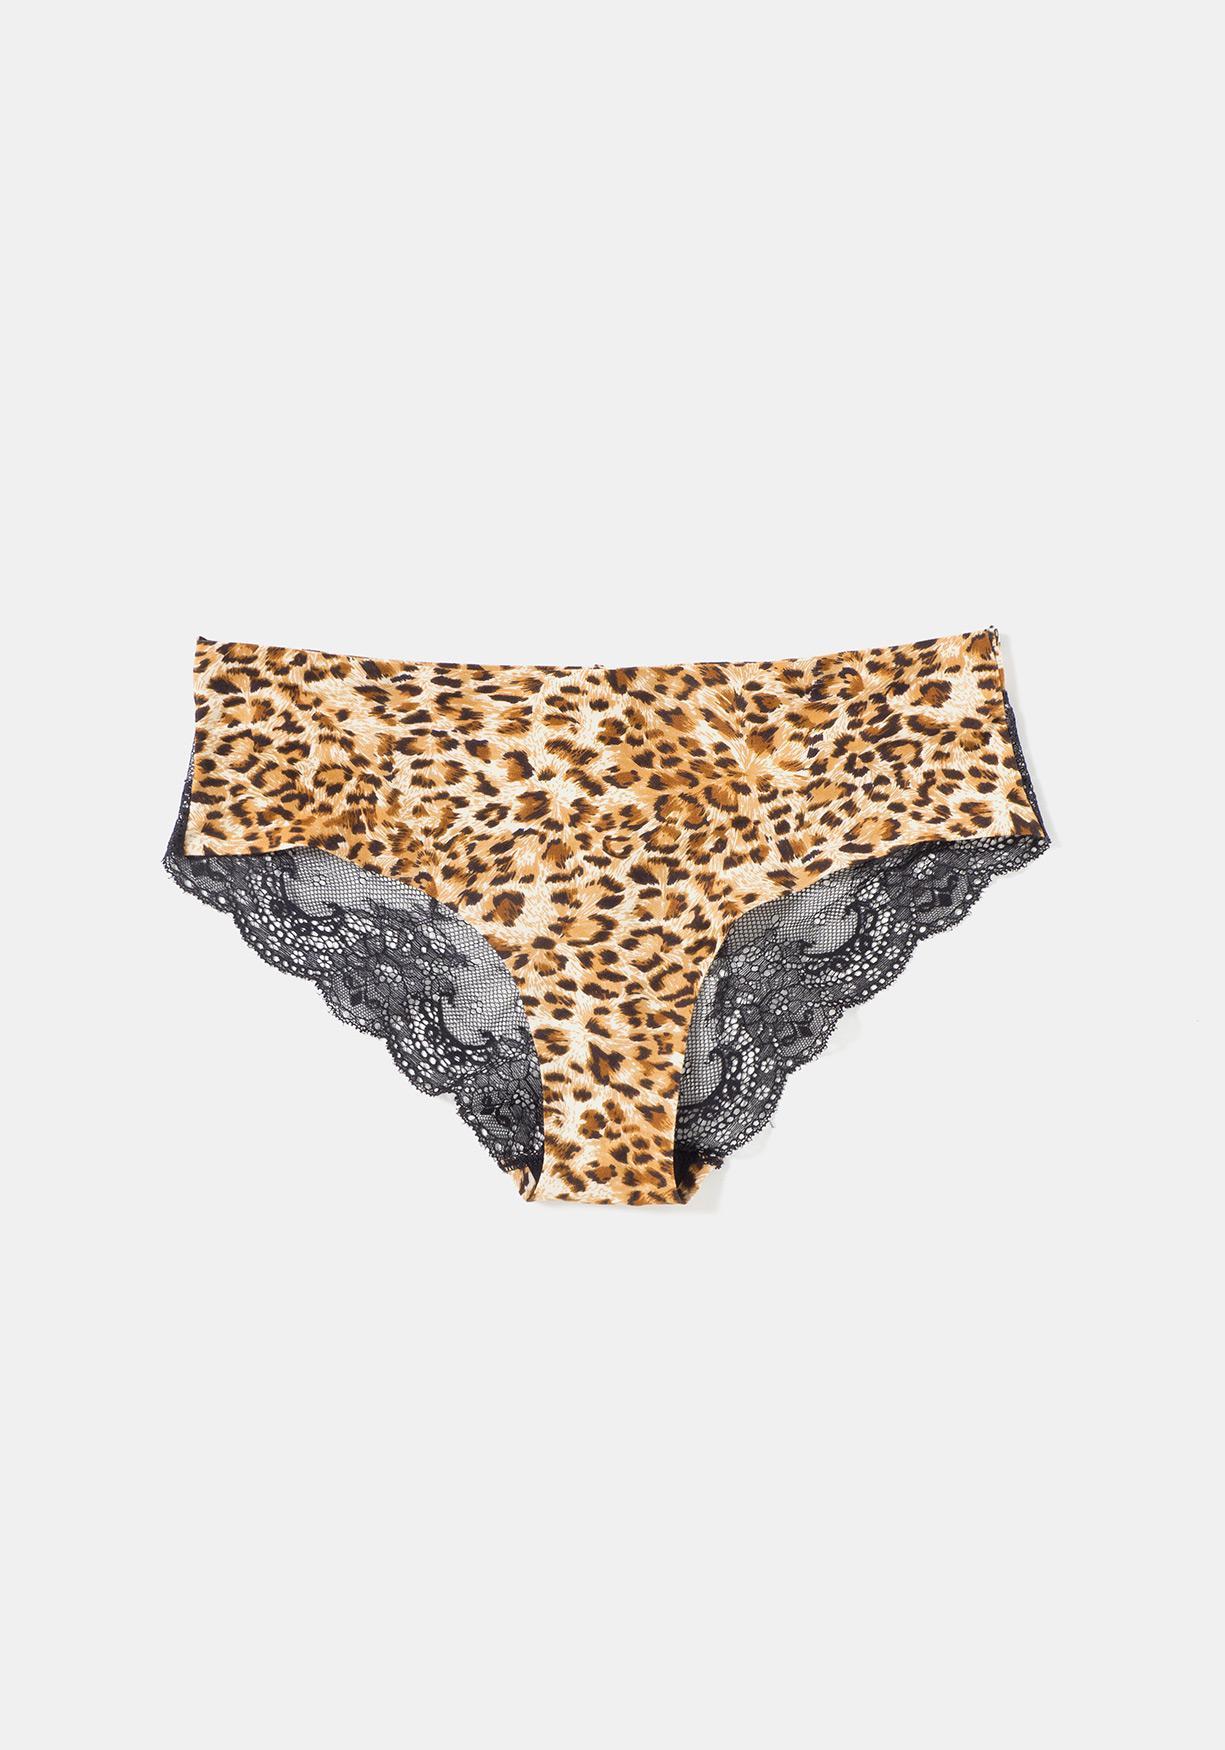 b8e366b21cc4 Comprar Braguita bikini estampada y con encaje. ¡Aprovéchate de ...